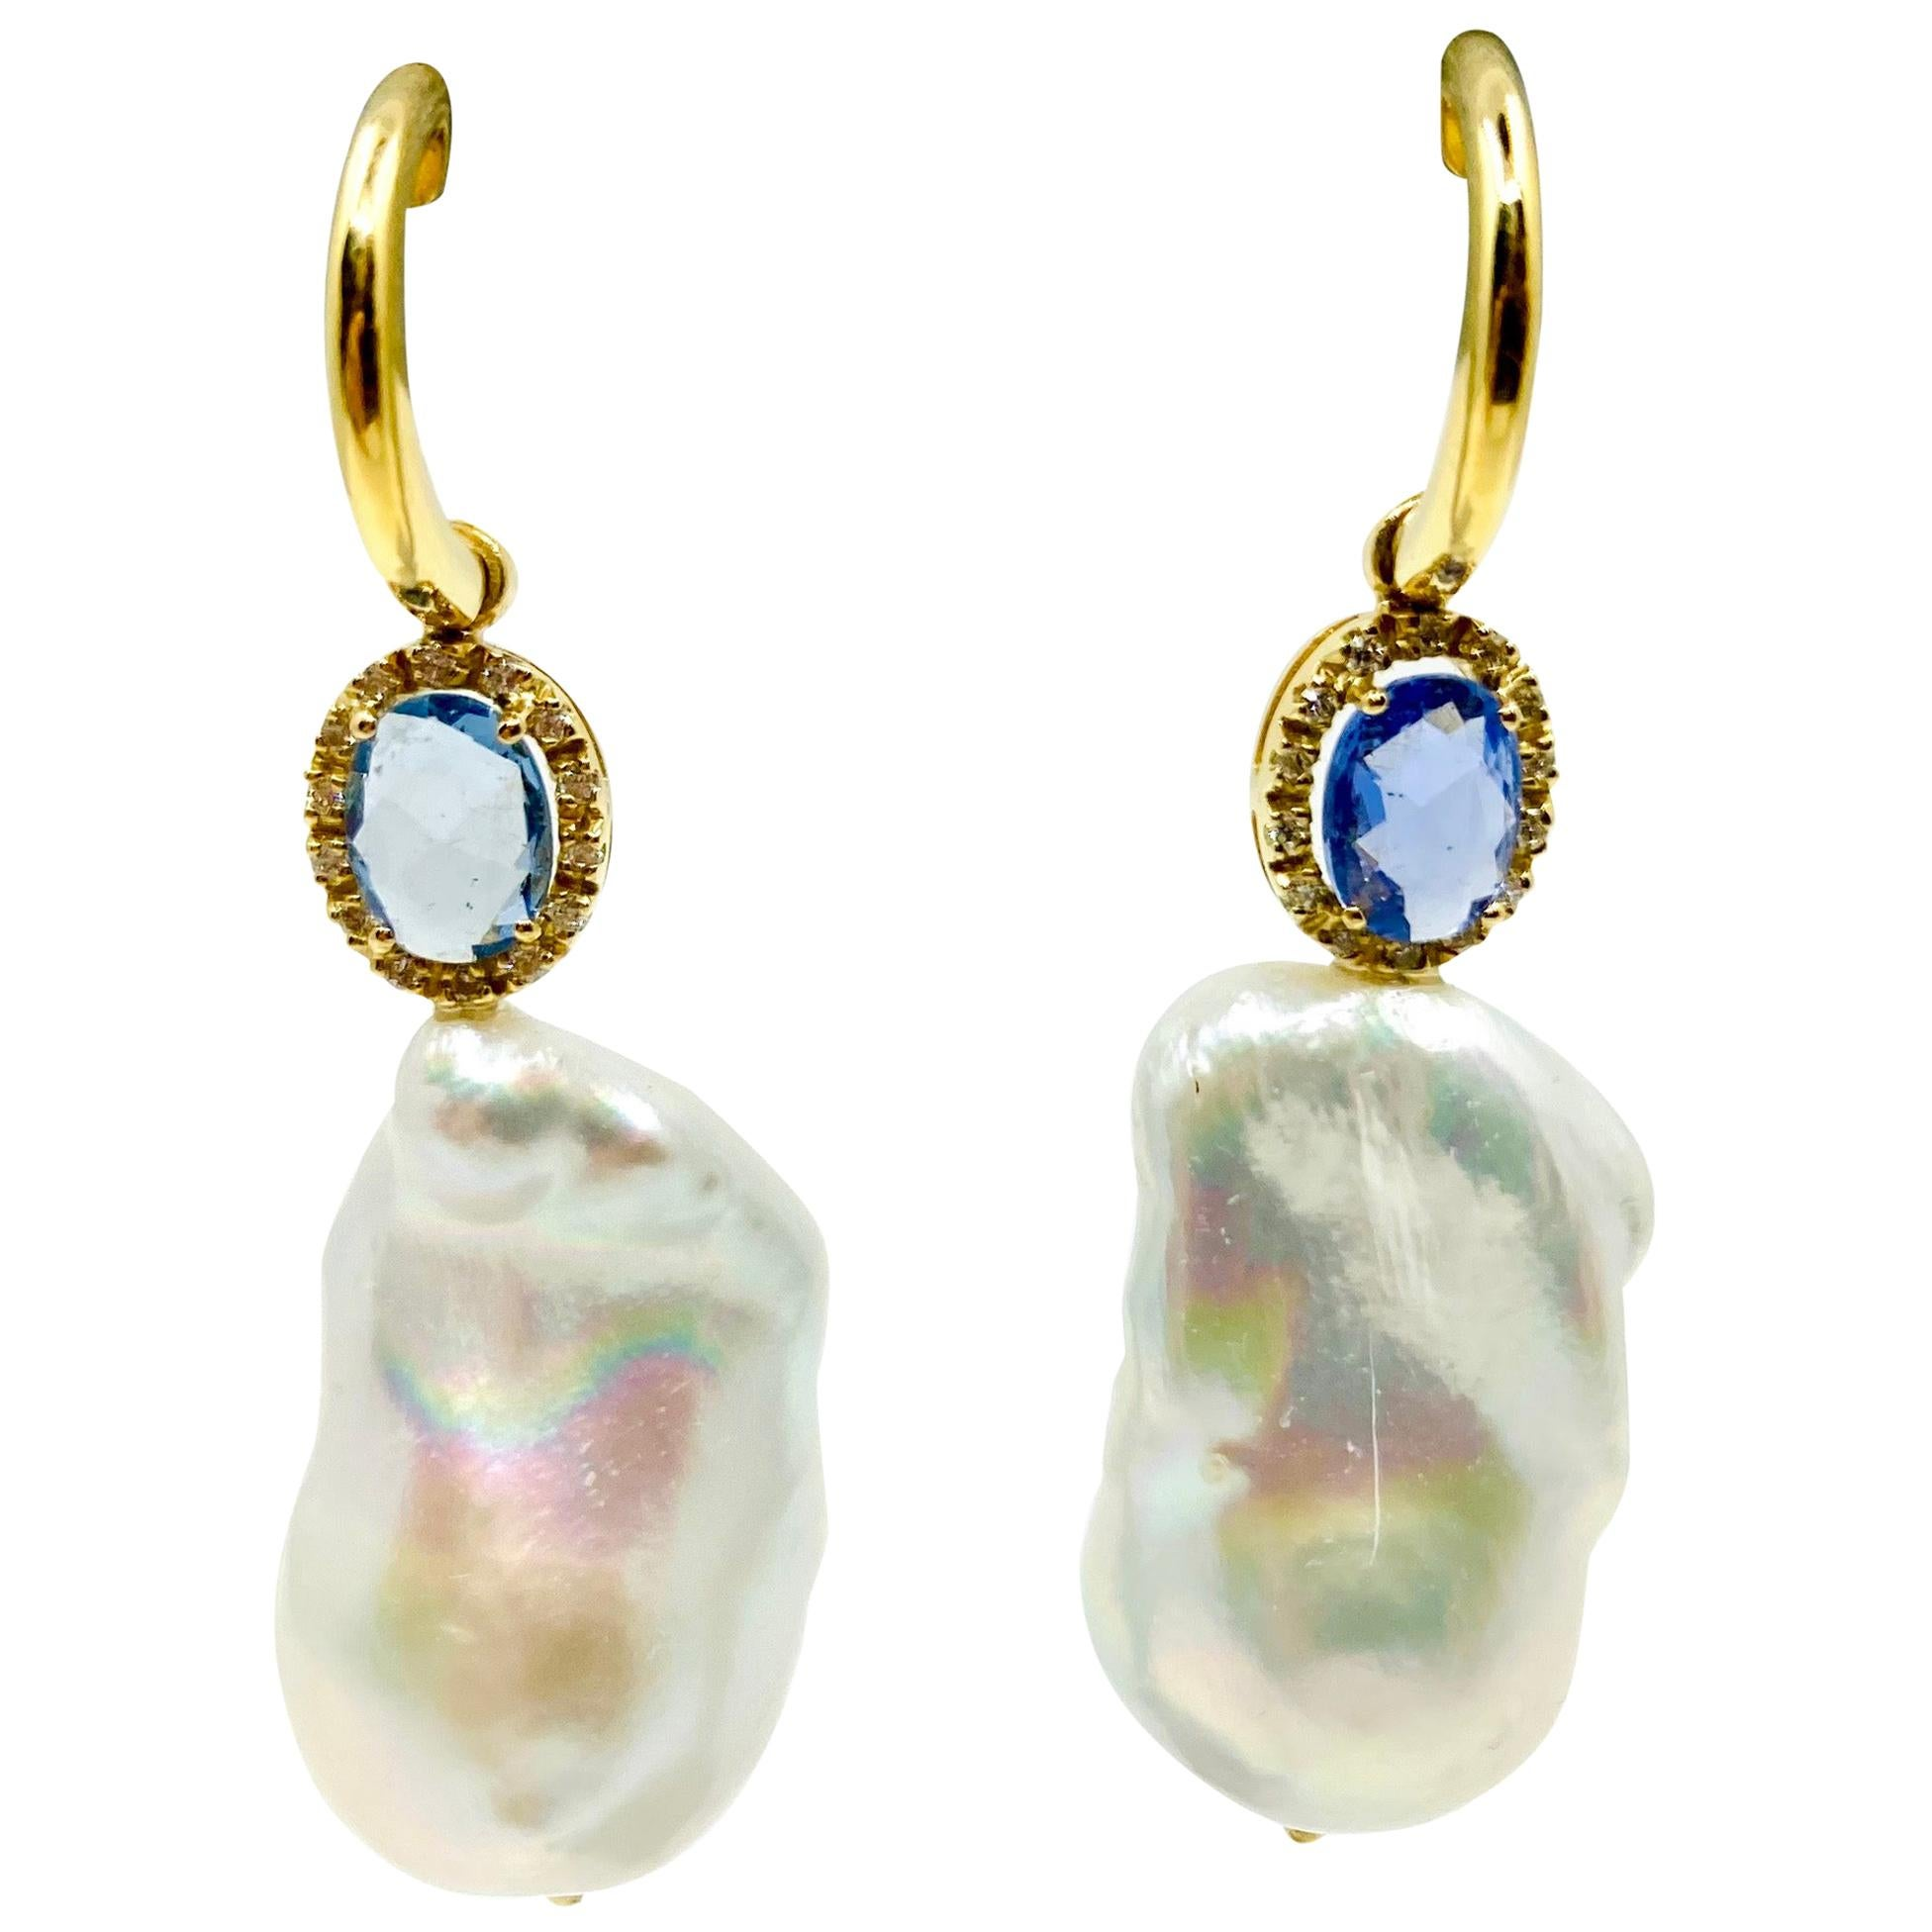 18 Karat Yellow Gold Baroque Pearls, Sapphires and Diamonds Italian earrings